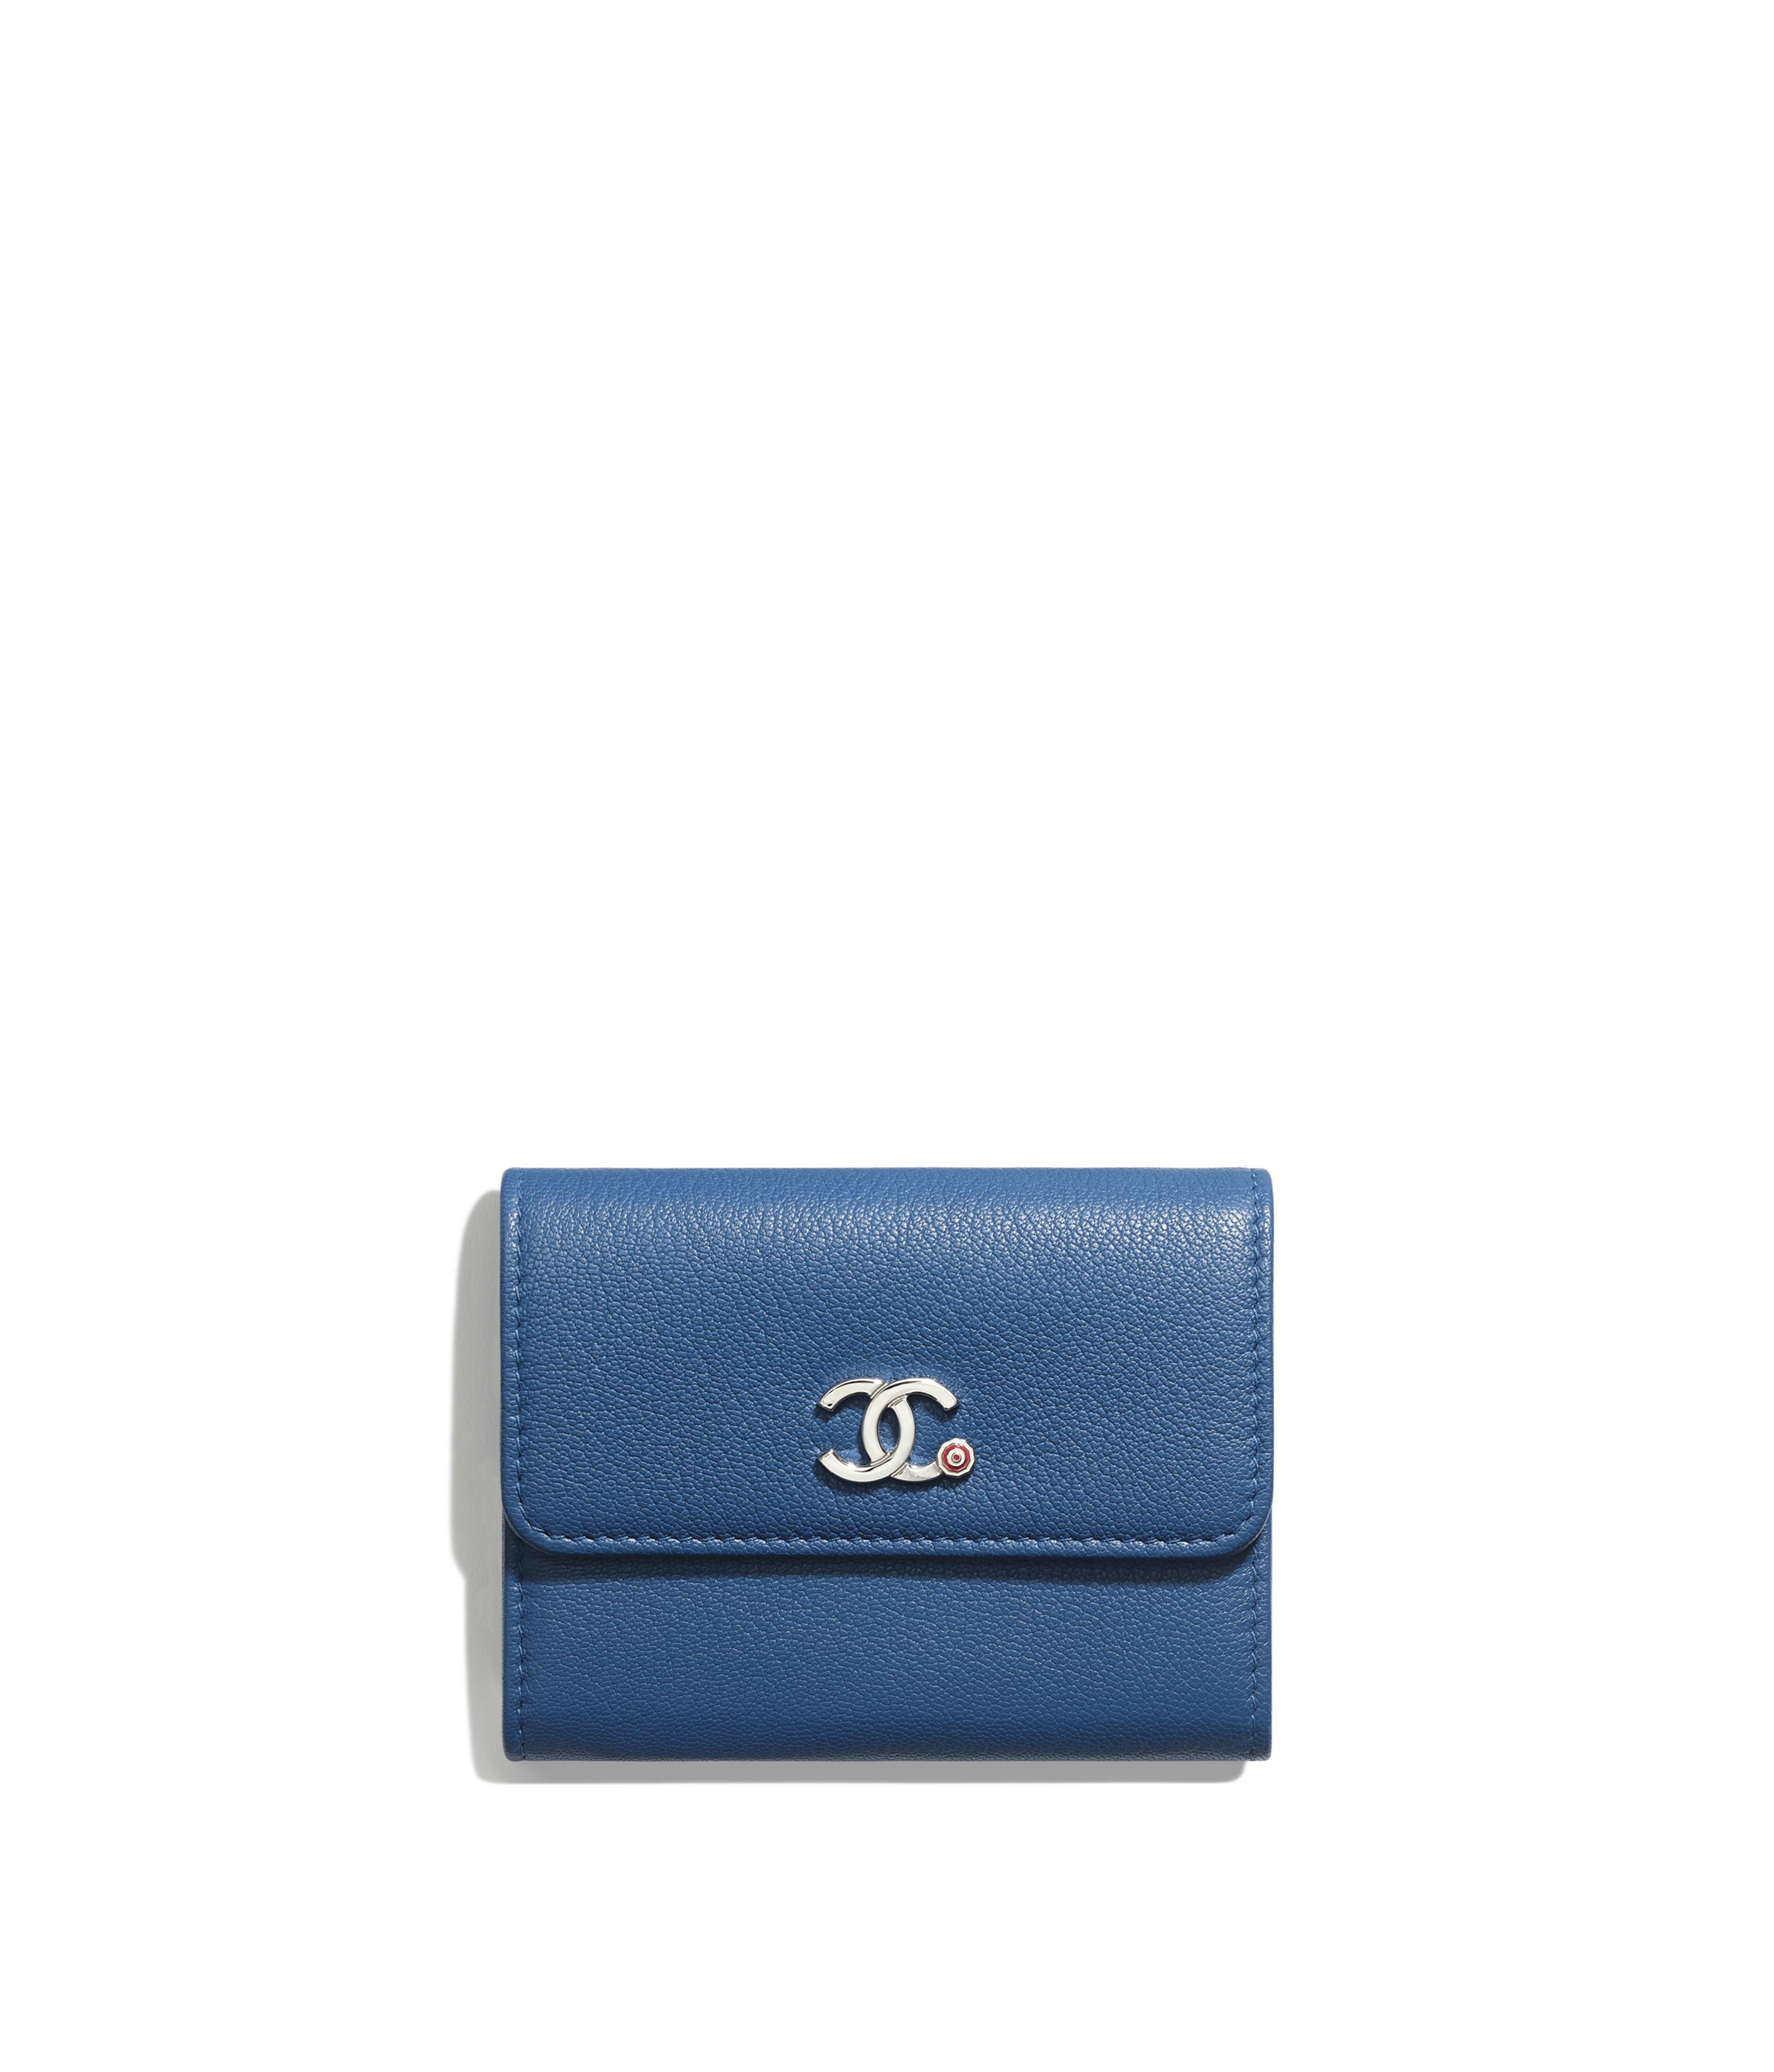 cb6cc891dd69a3 Flap Coin Purse Goatskin & Silver-Tone Metal, Dark Blue Ref.  AP0266B00322N4512